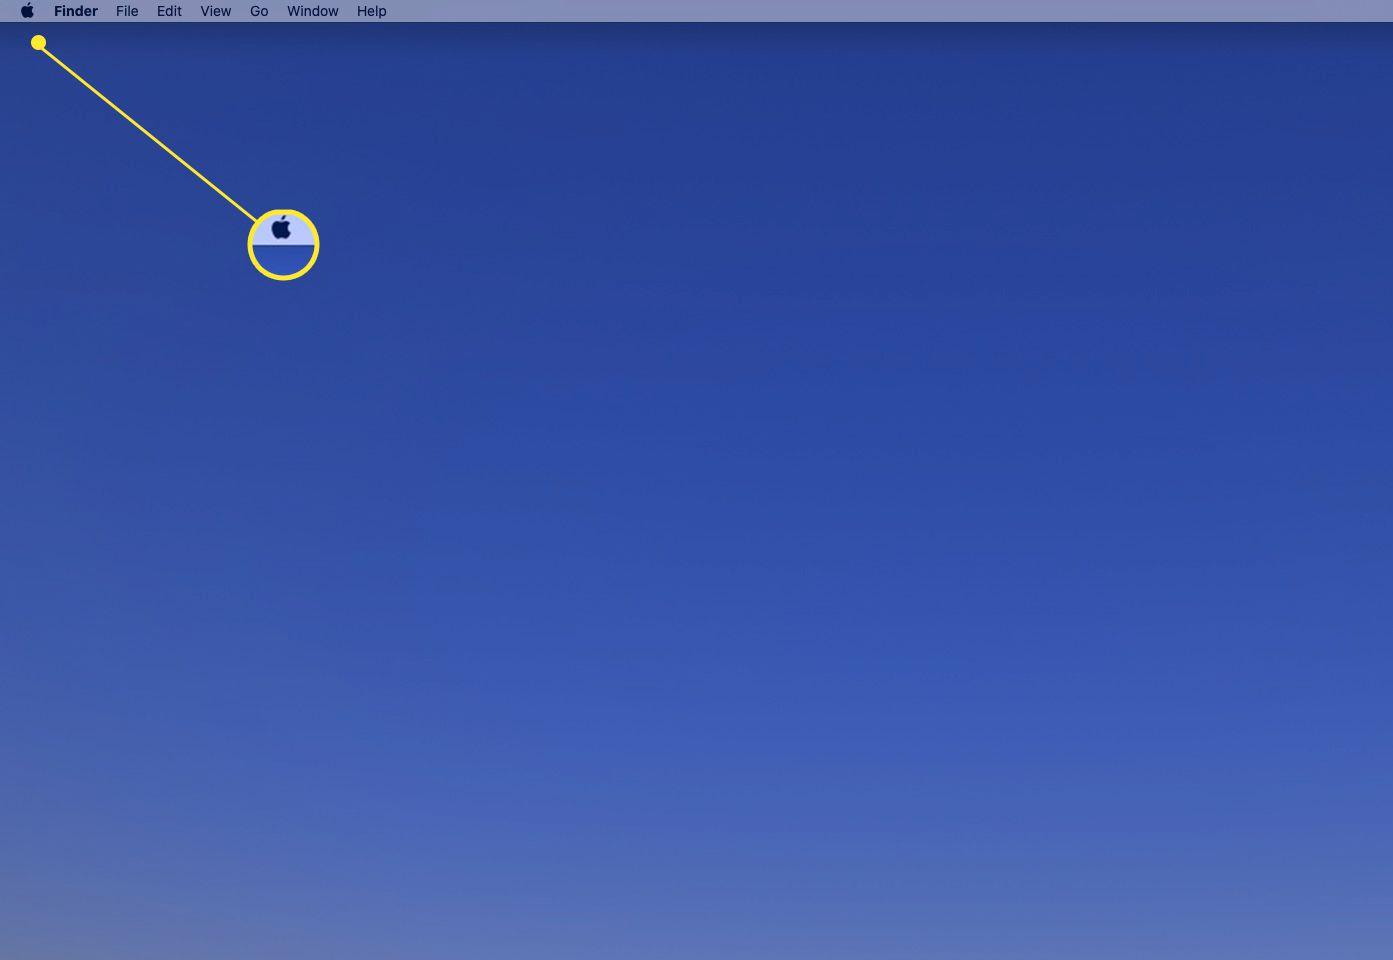 Mac desktop with the Apple menu highlighted